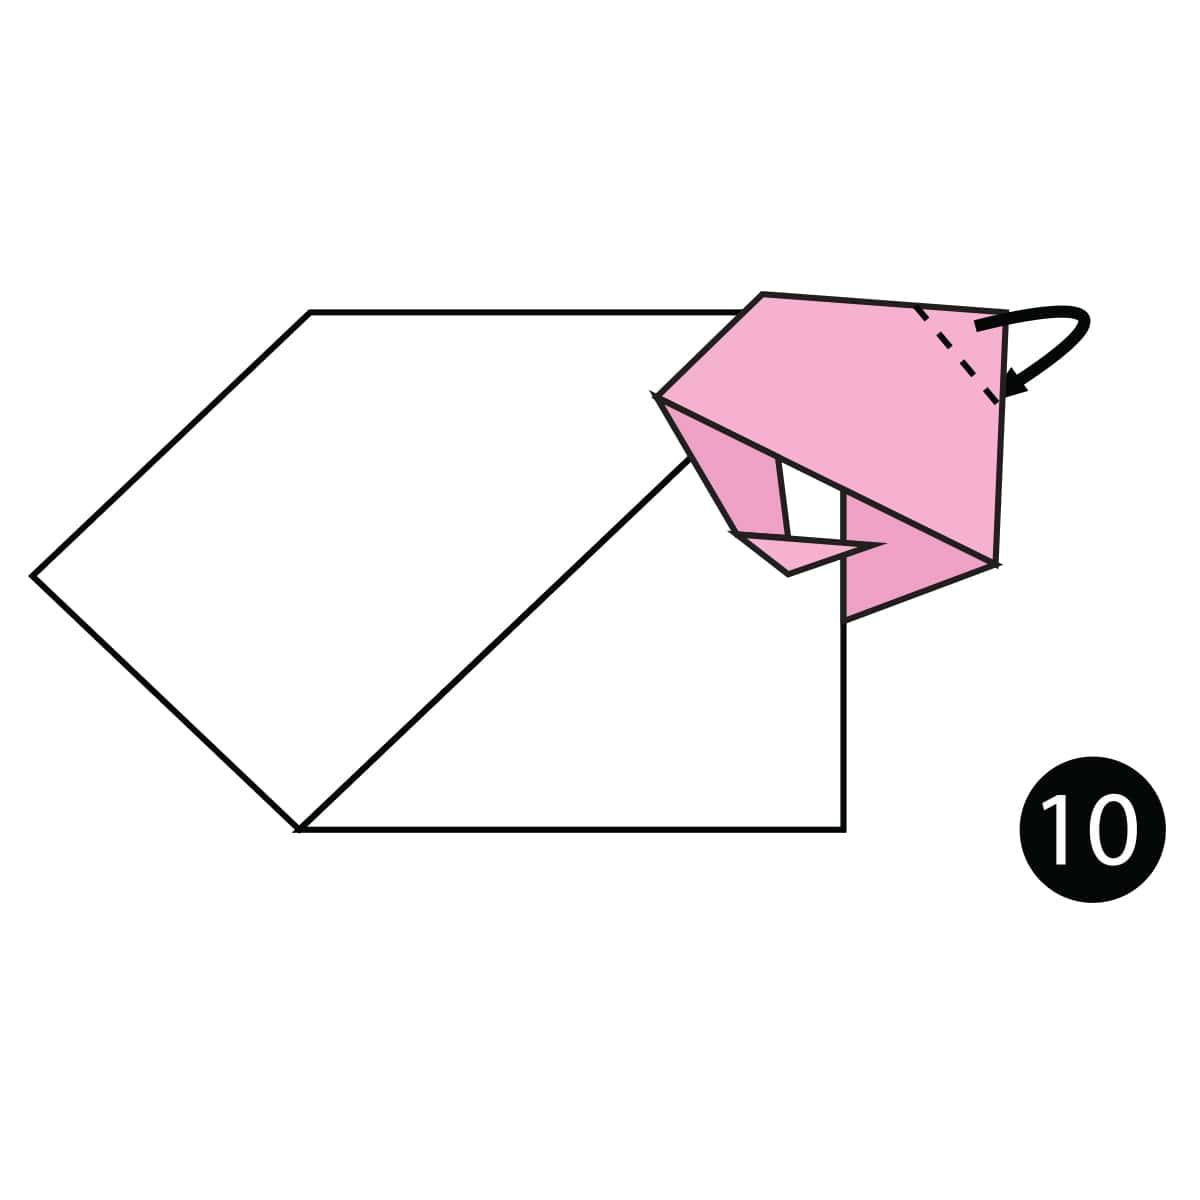 Sheep Step 10